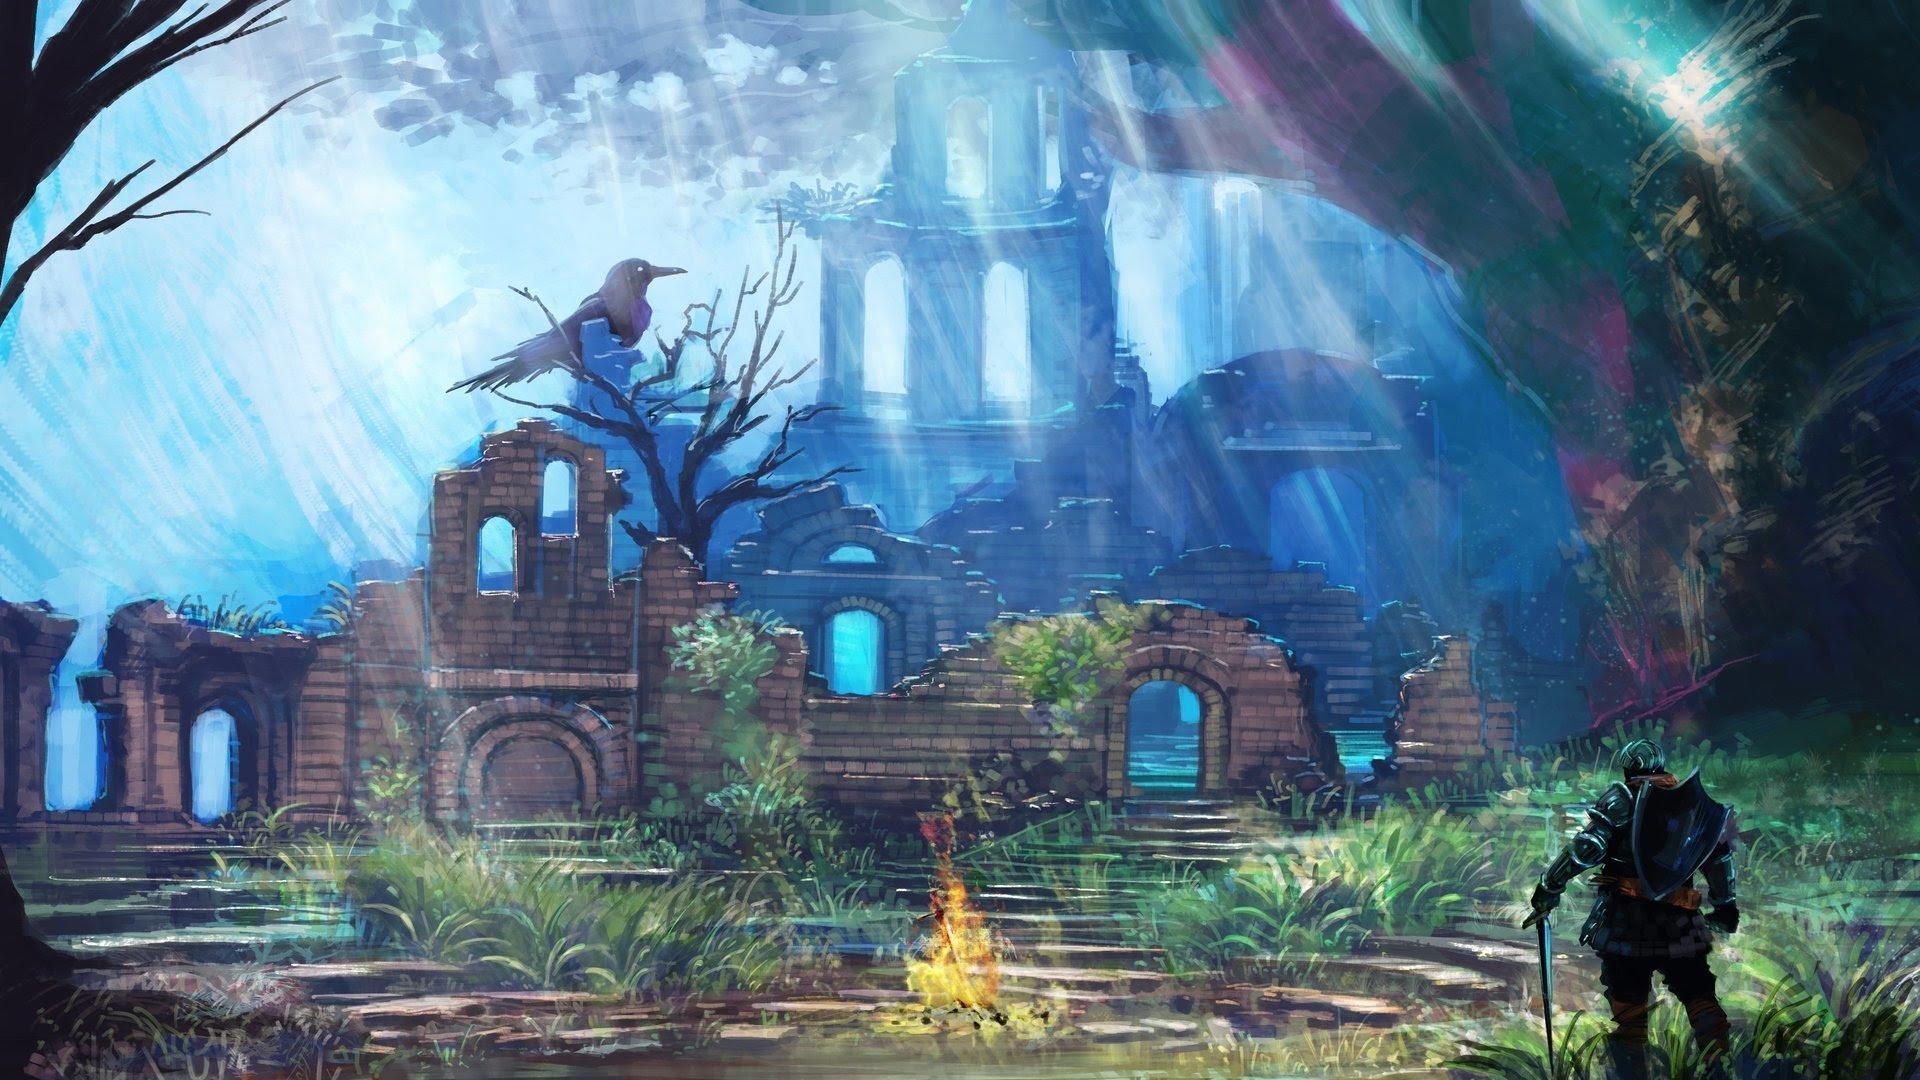 Dark Souls 3 Wallpaper Download Free Hd Wallpapers